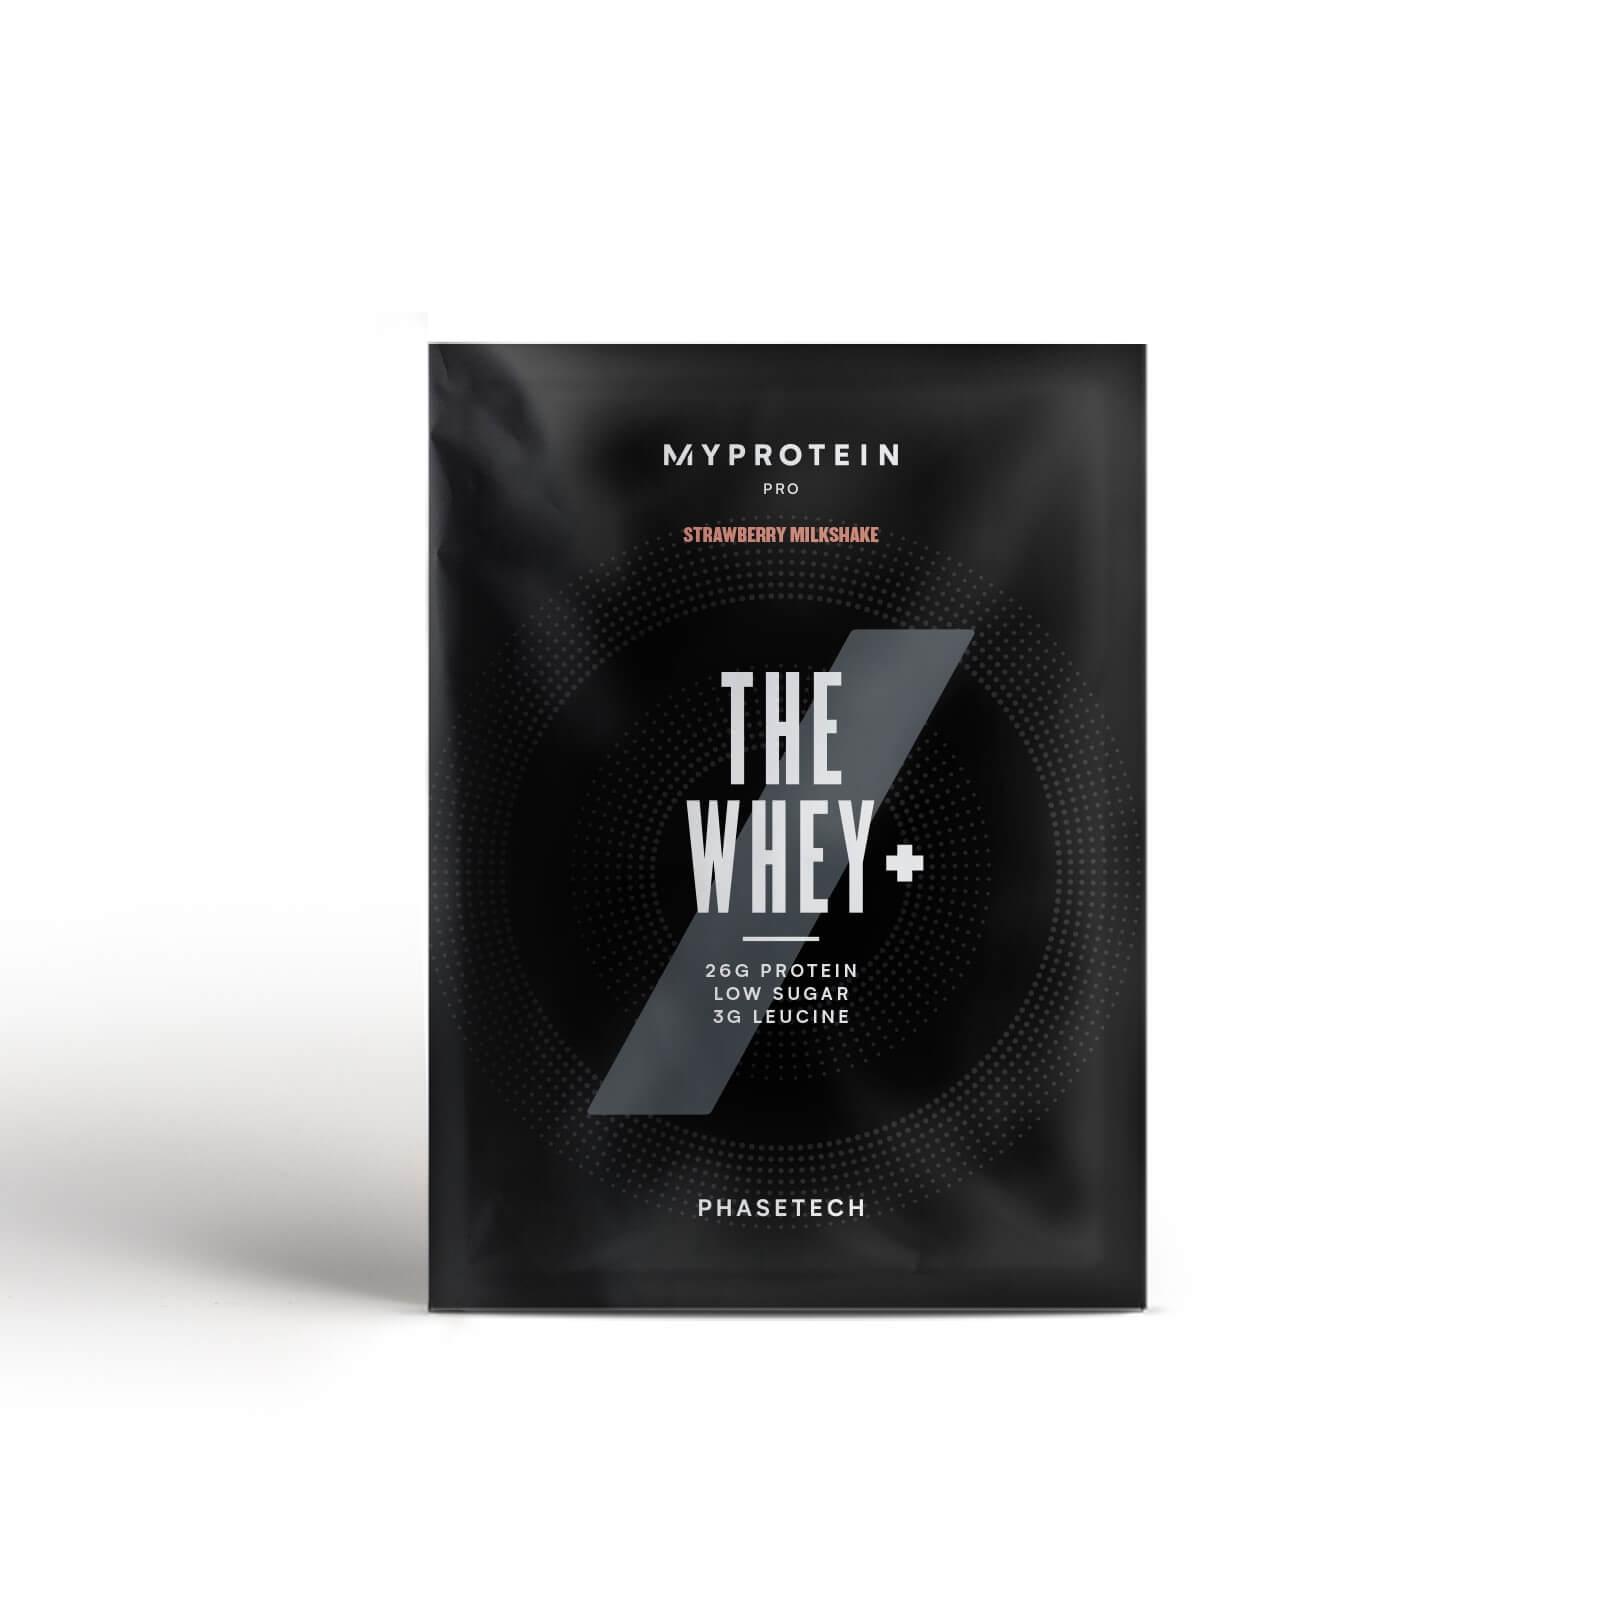 THE Whey+ (Échantillon) - Milkshake Fraise